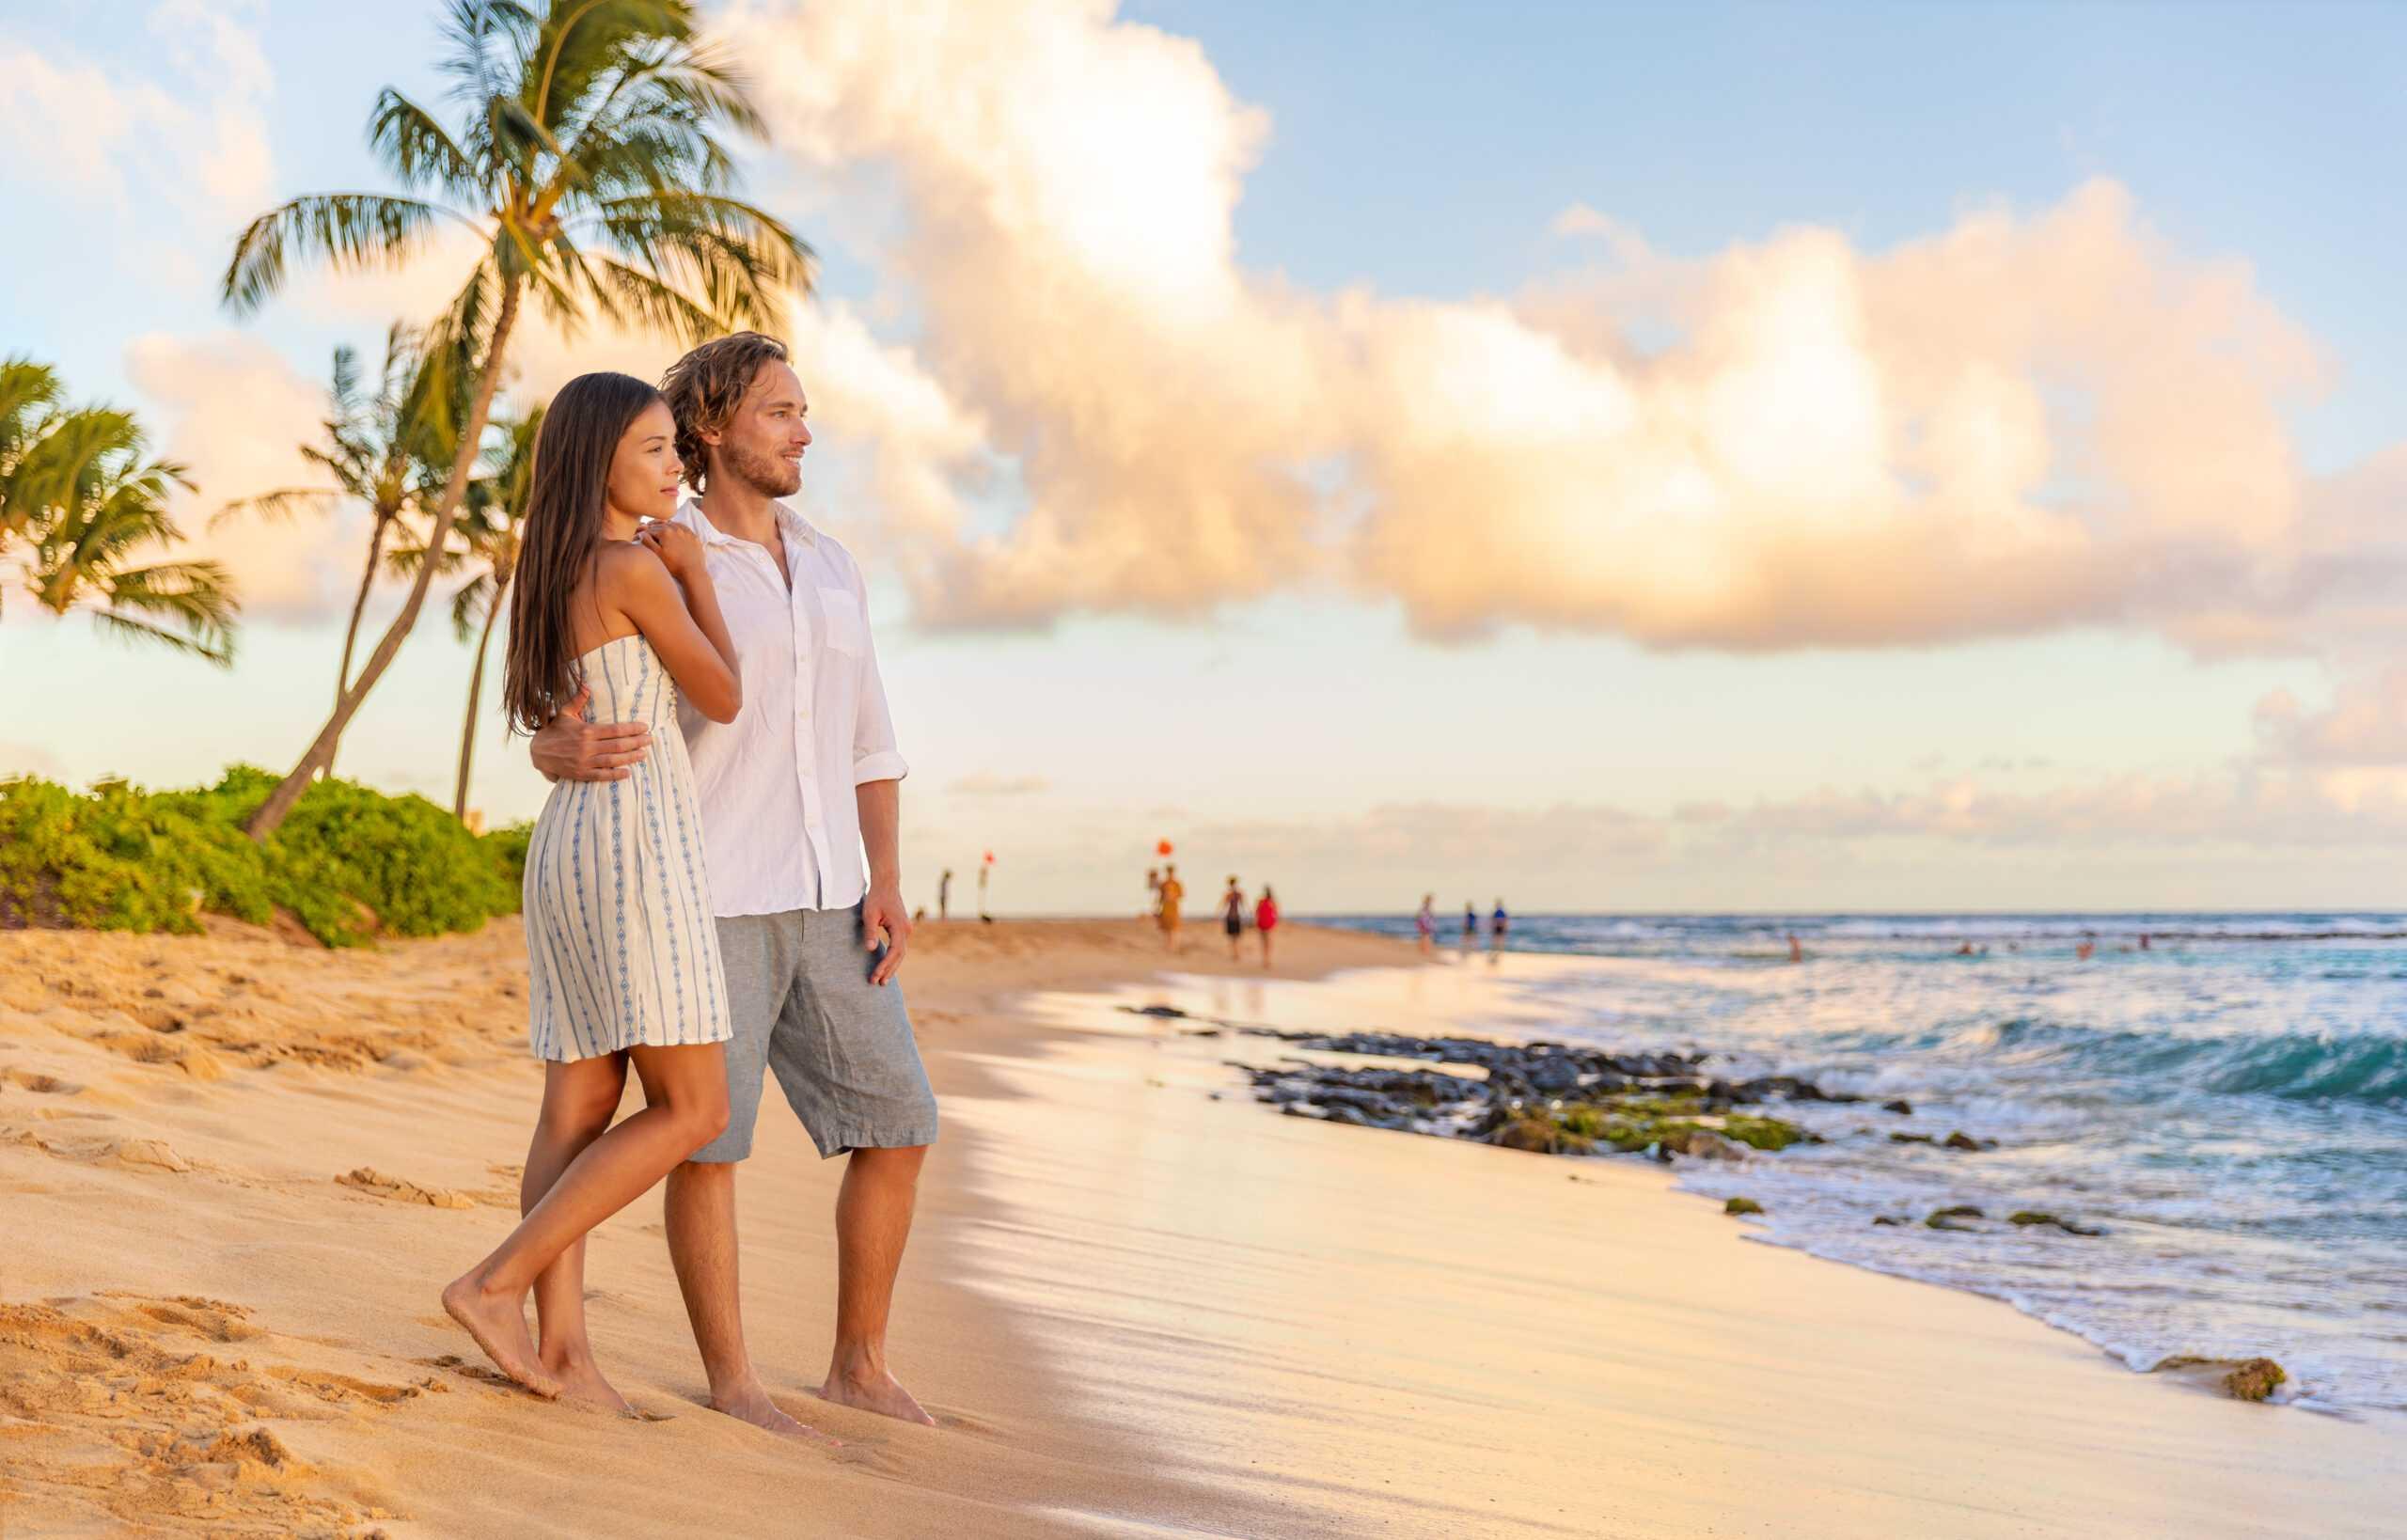 Доминика: инвестиционная программа